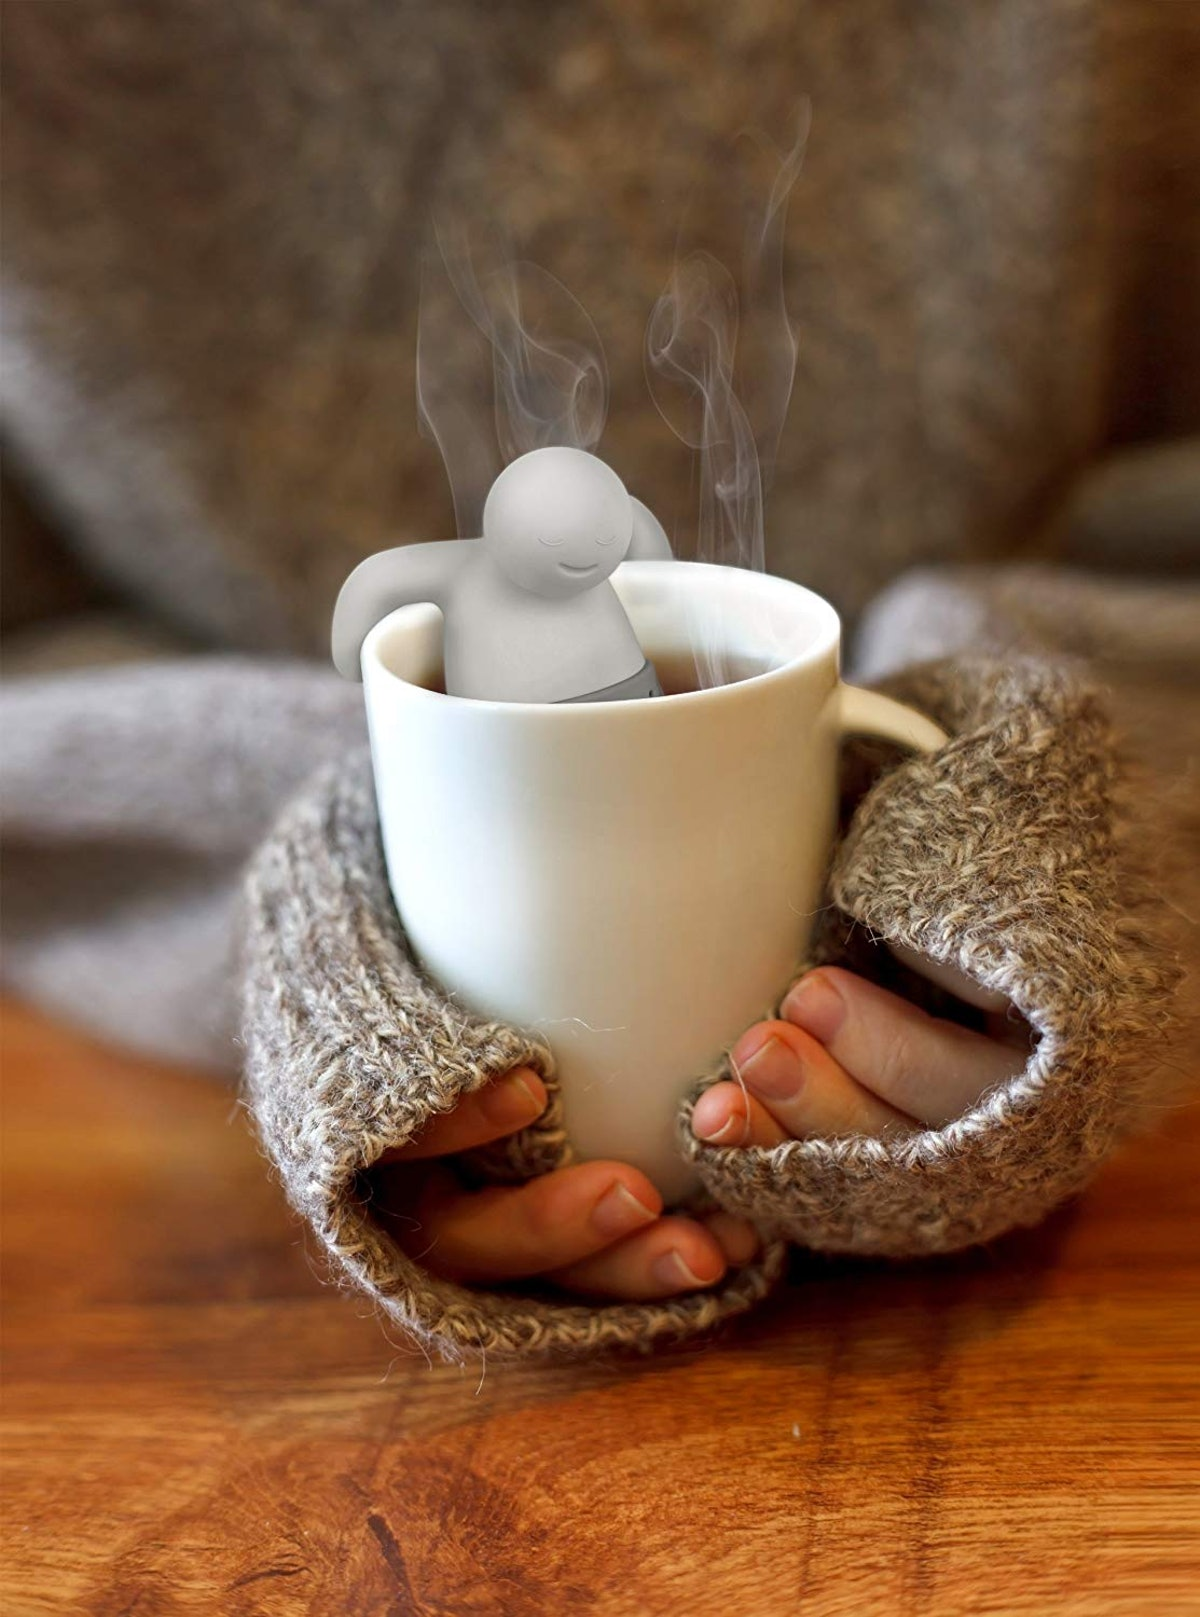 Fred & Friends Mr. Tea Infuser